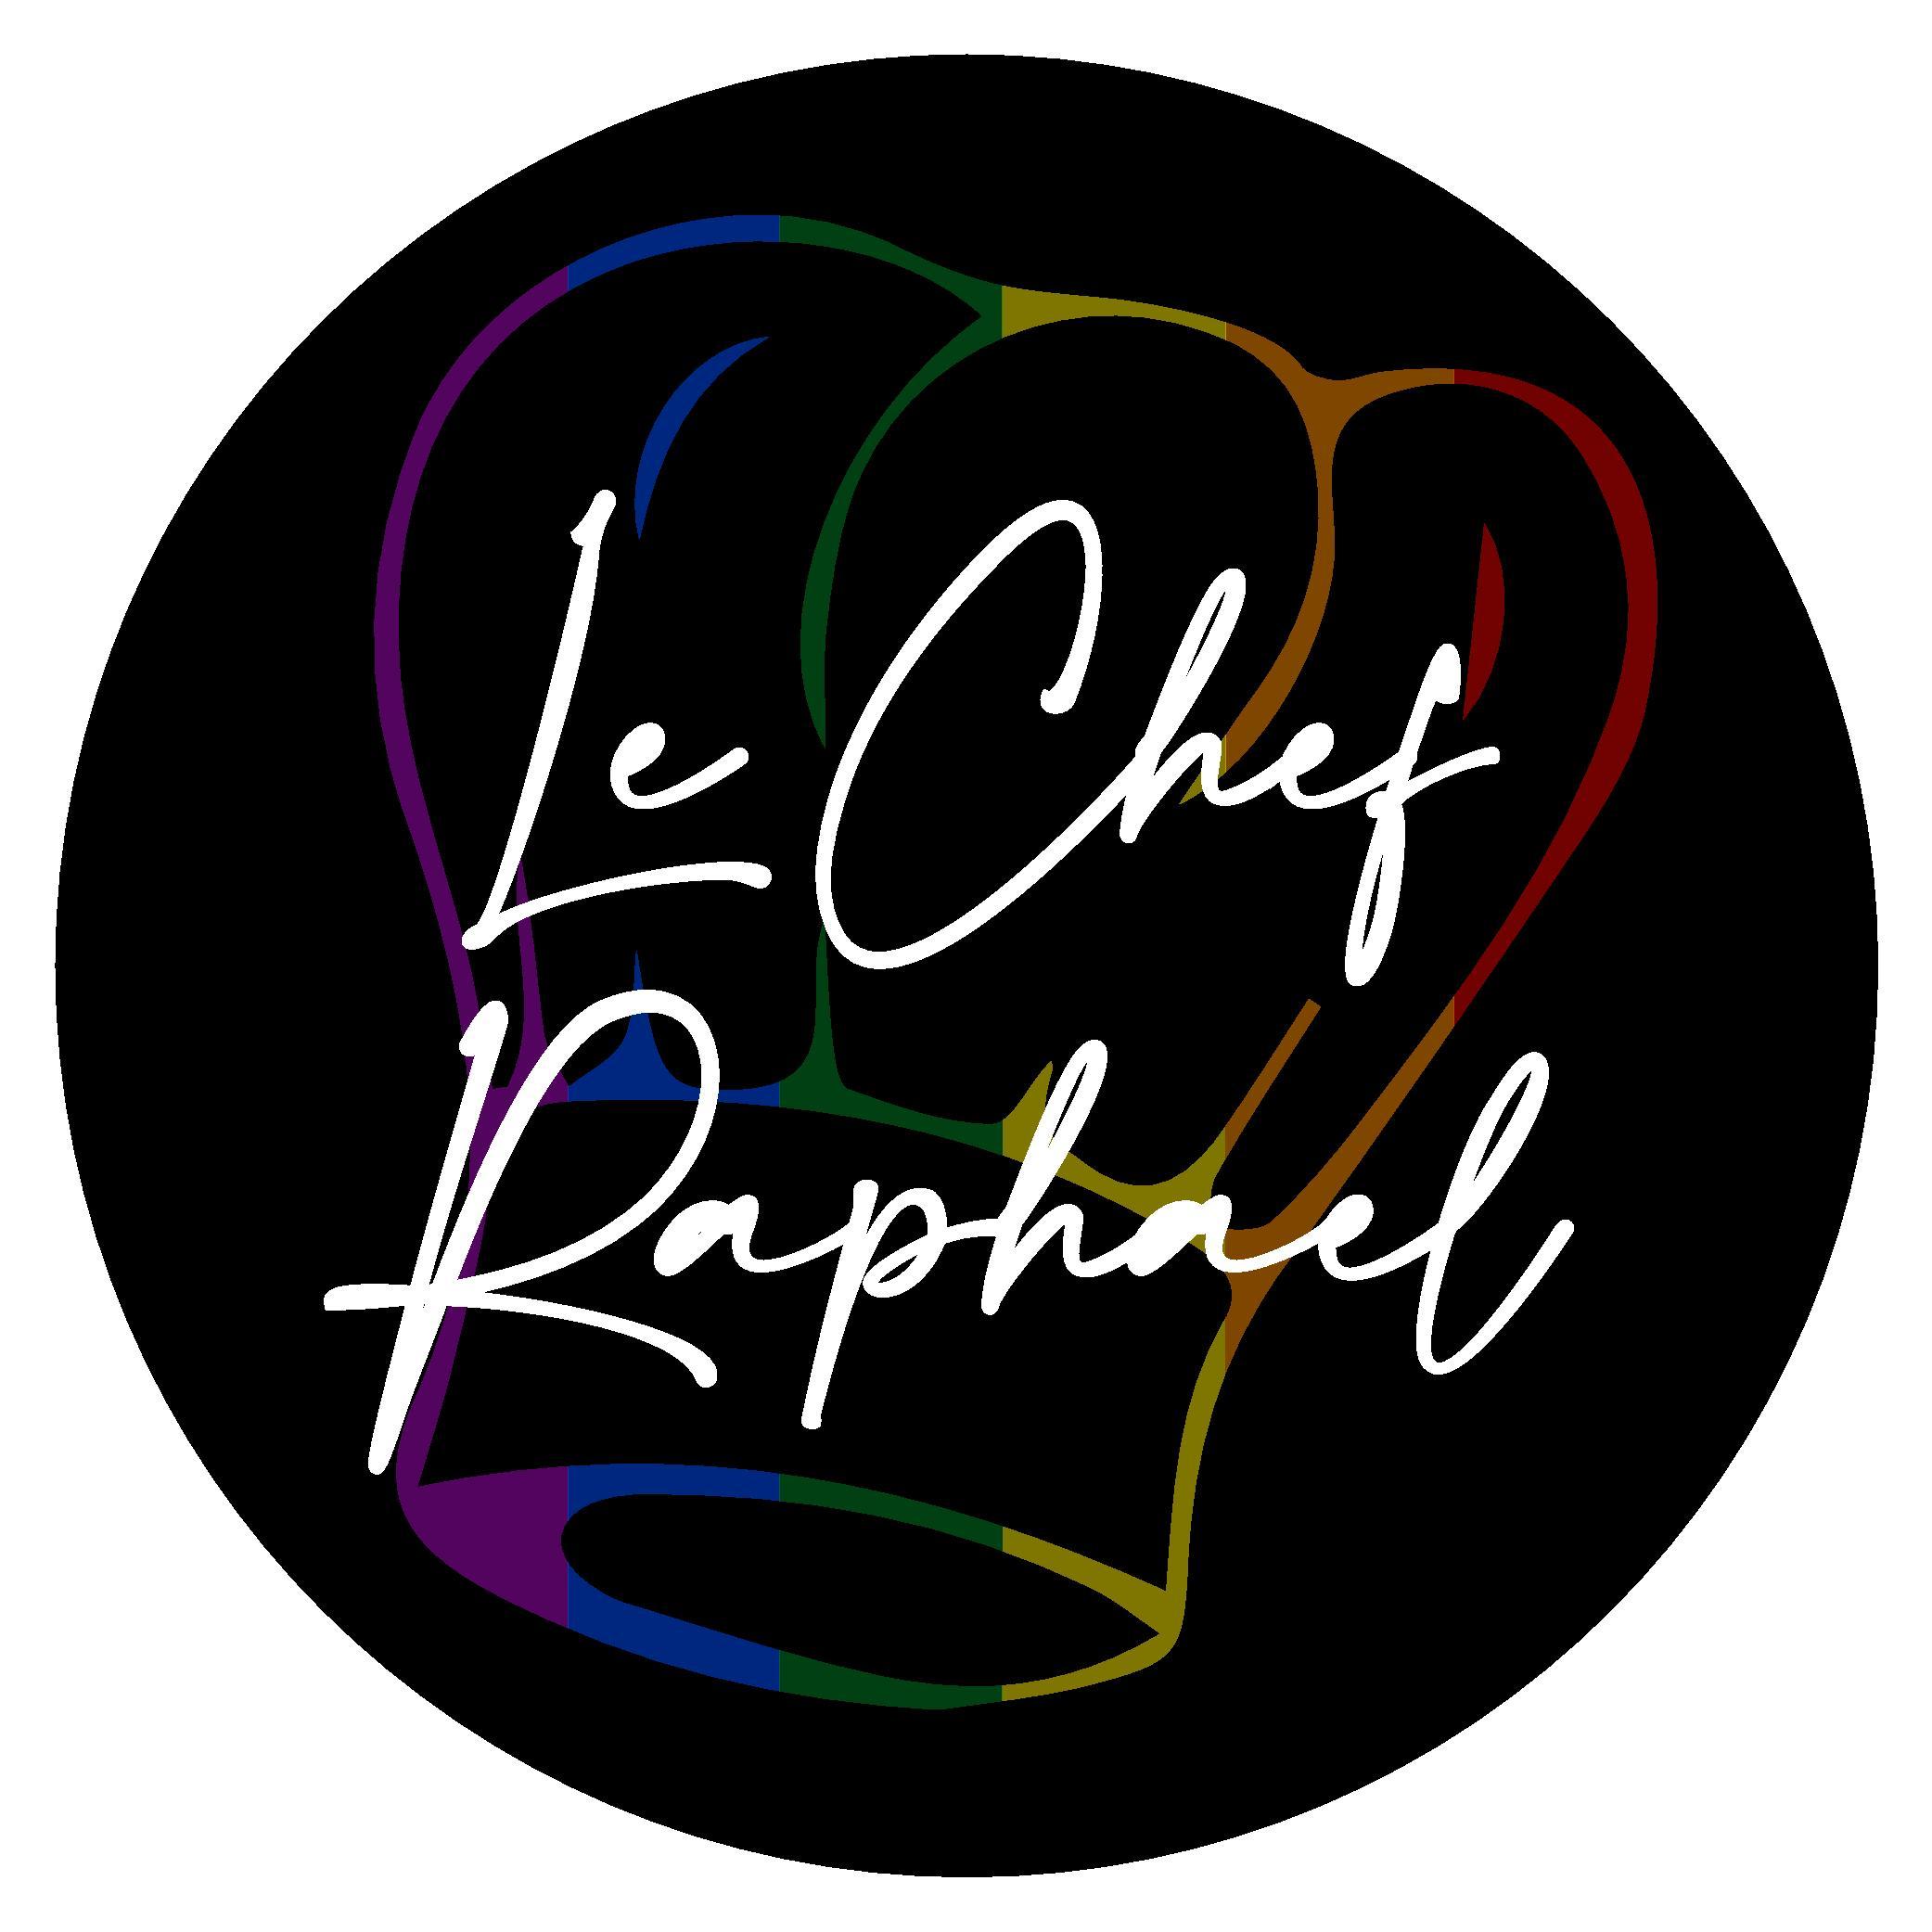 Logo Le Chef Raphael